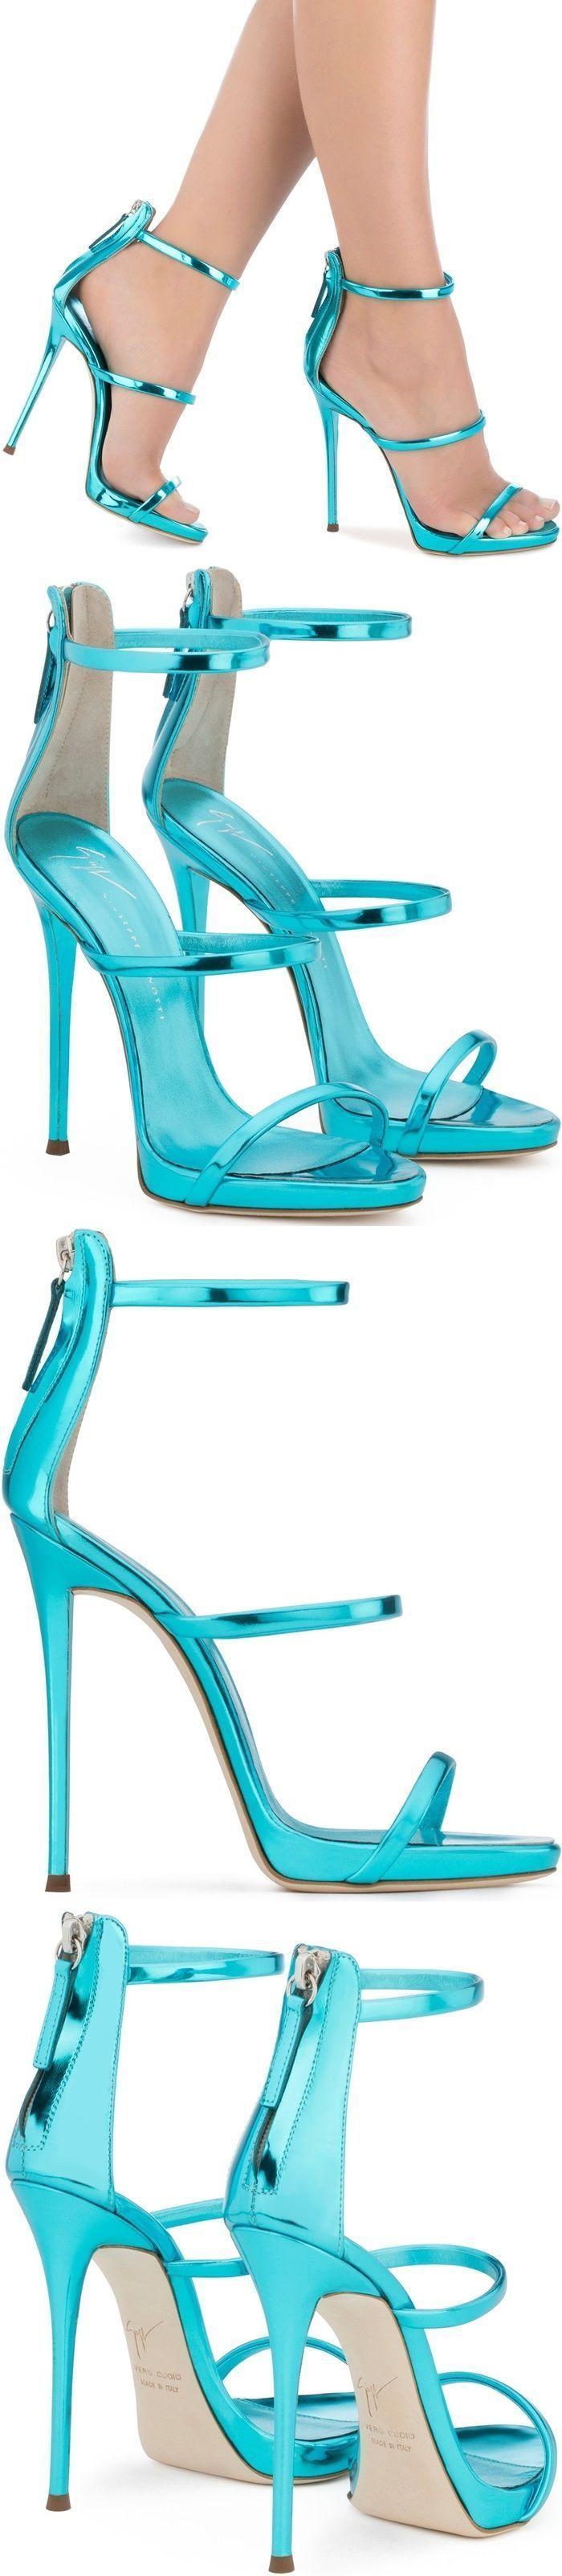 Blue patent leather sandal with three straps #velvetshoeshighheels #giuseppezanottiheelssandals